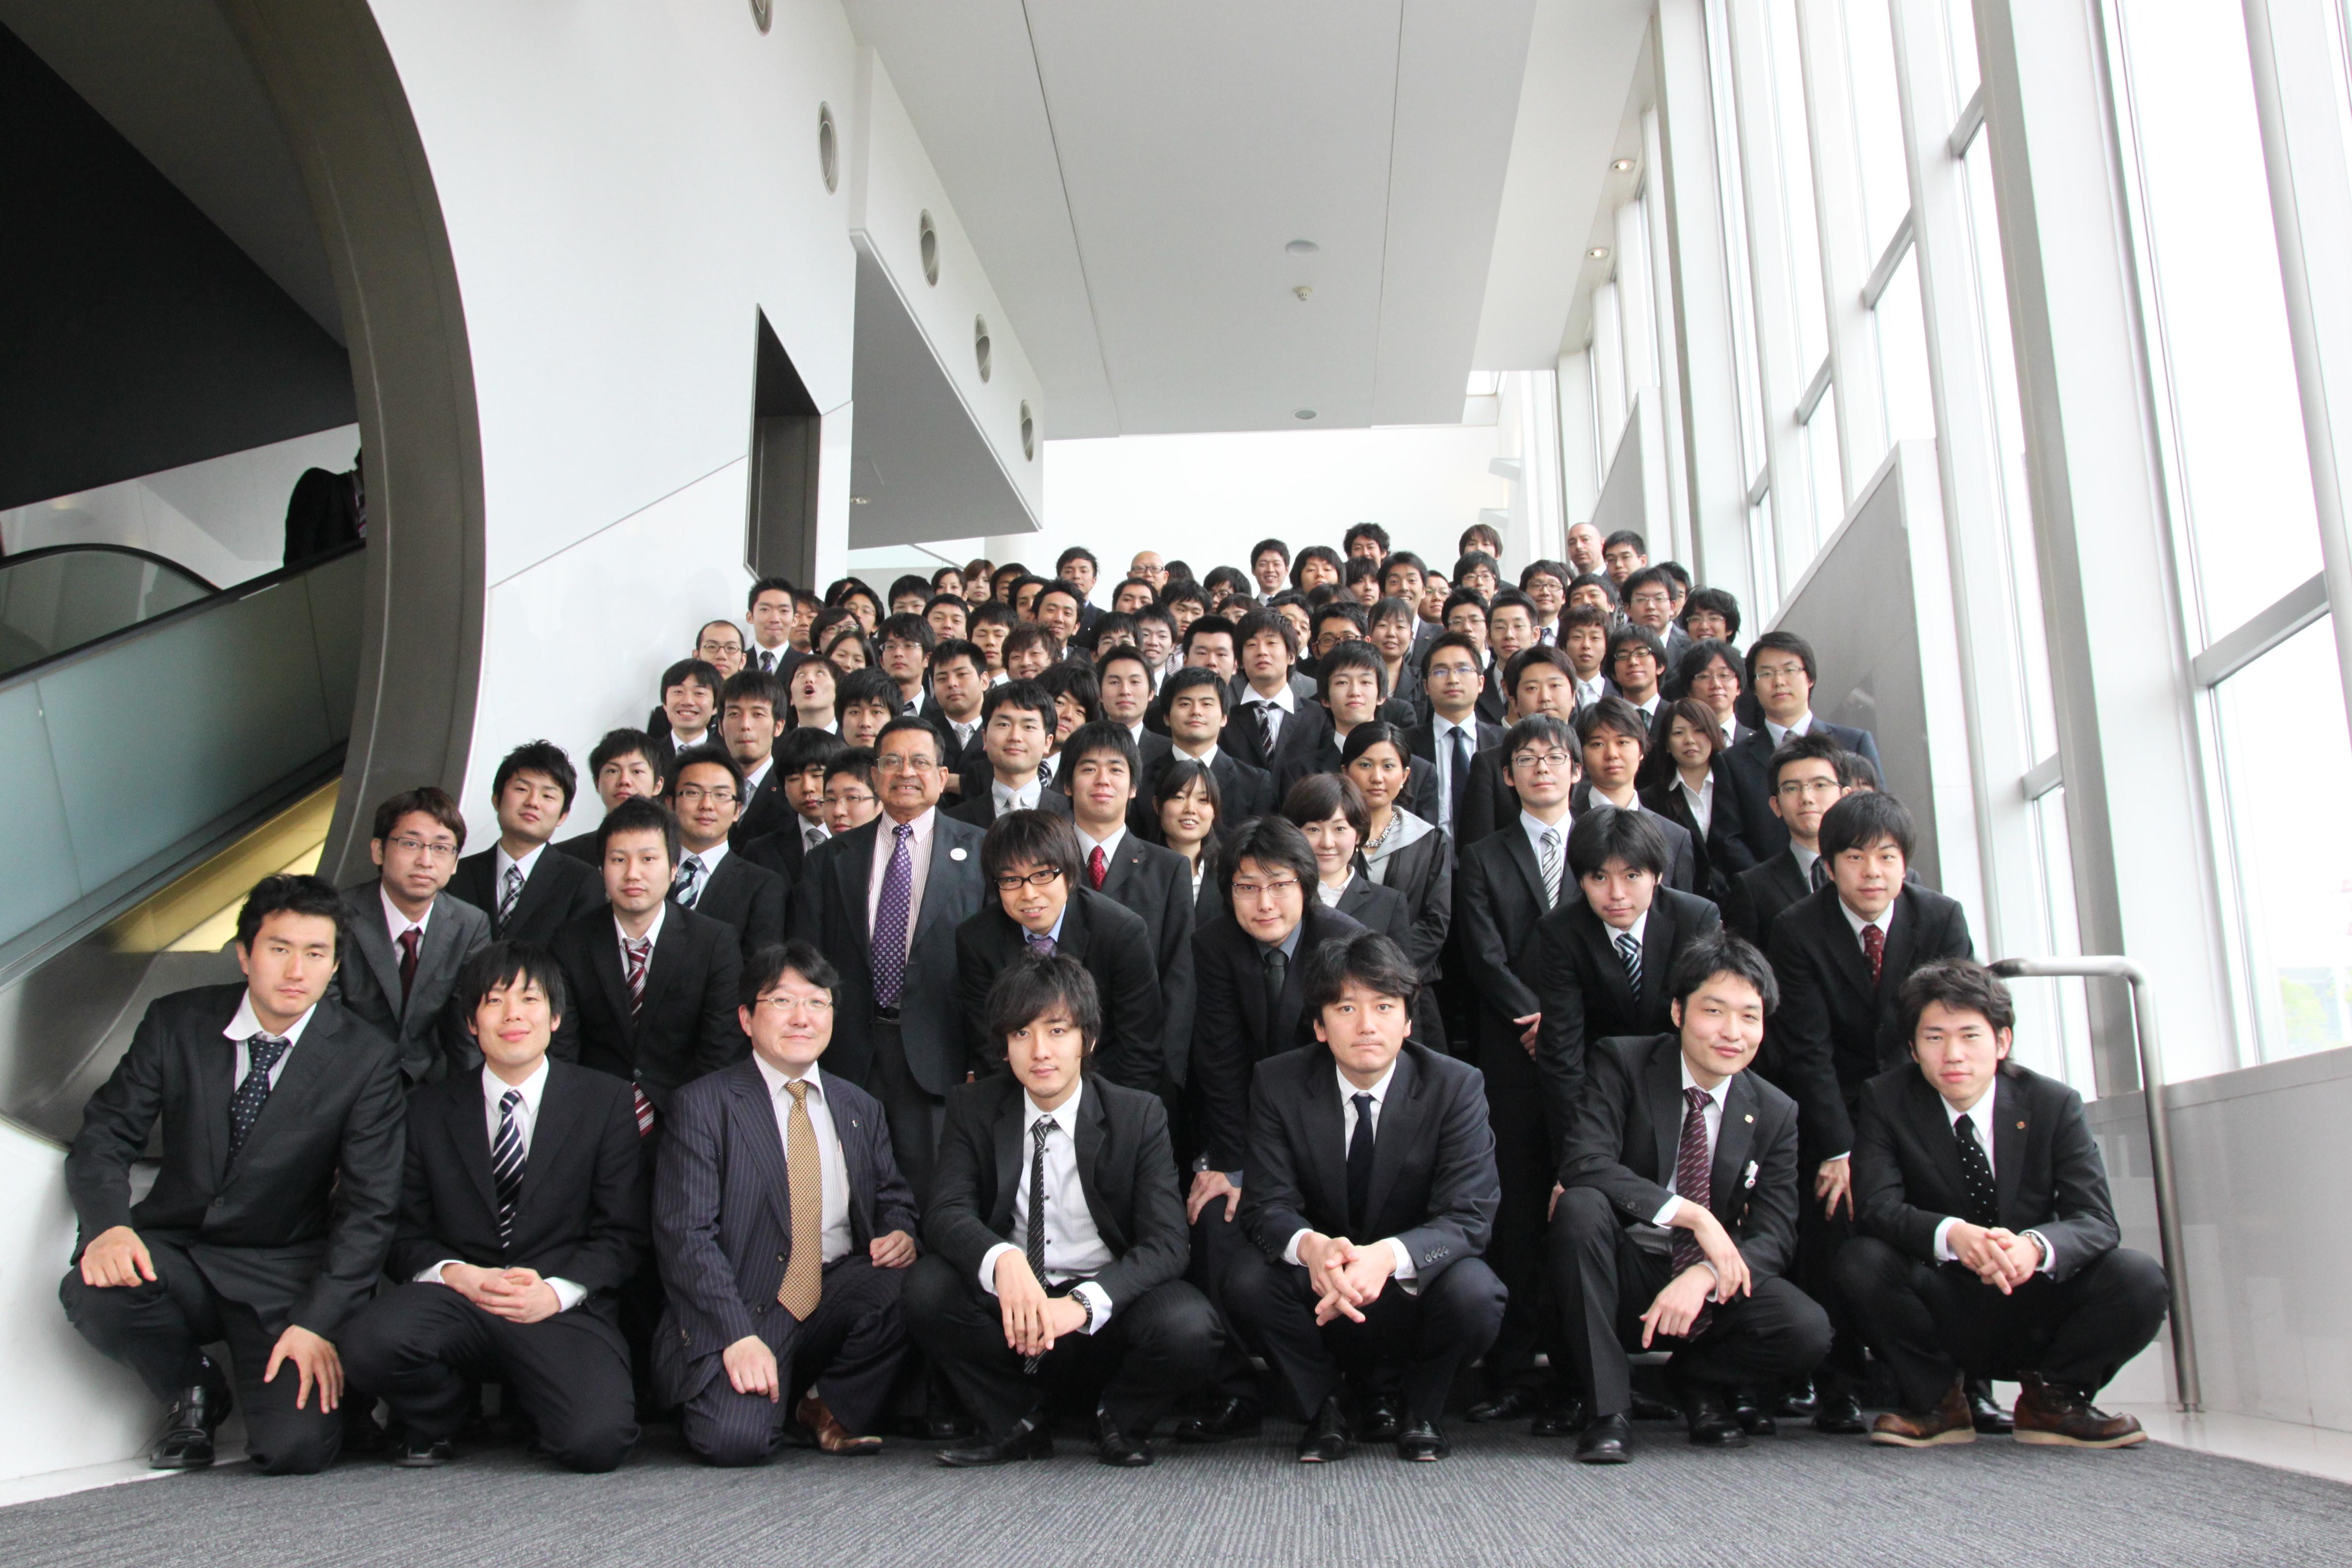 http://blog.higashi-tokushukai.or.jp/ydblog/IMG_6819%20%282%29.JPG